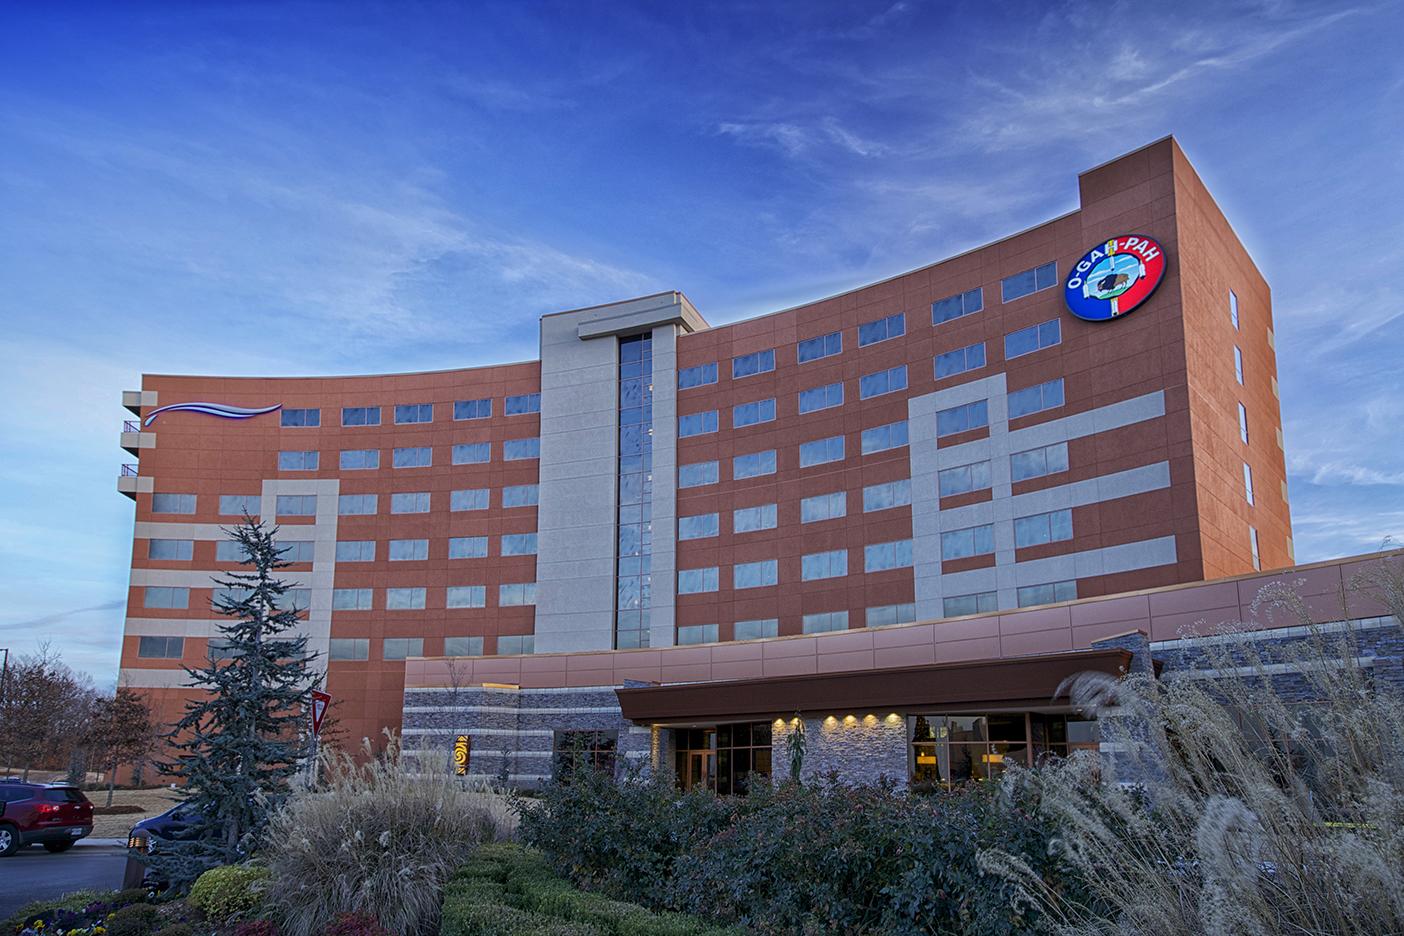 Downstream Casino Hotel Exterior Day Photo